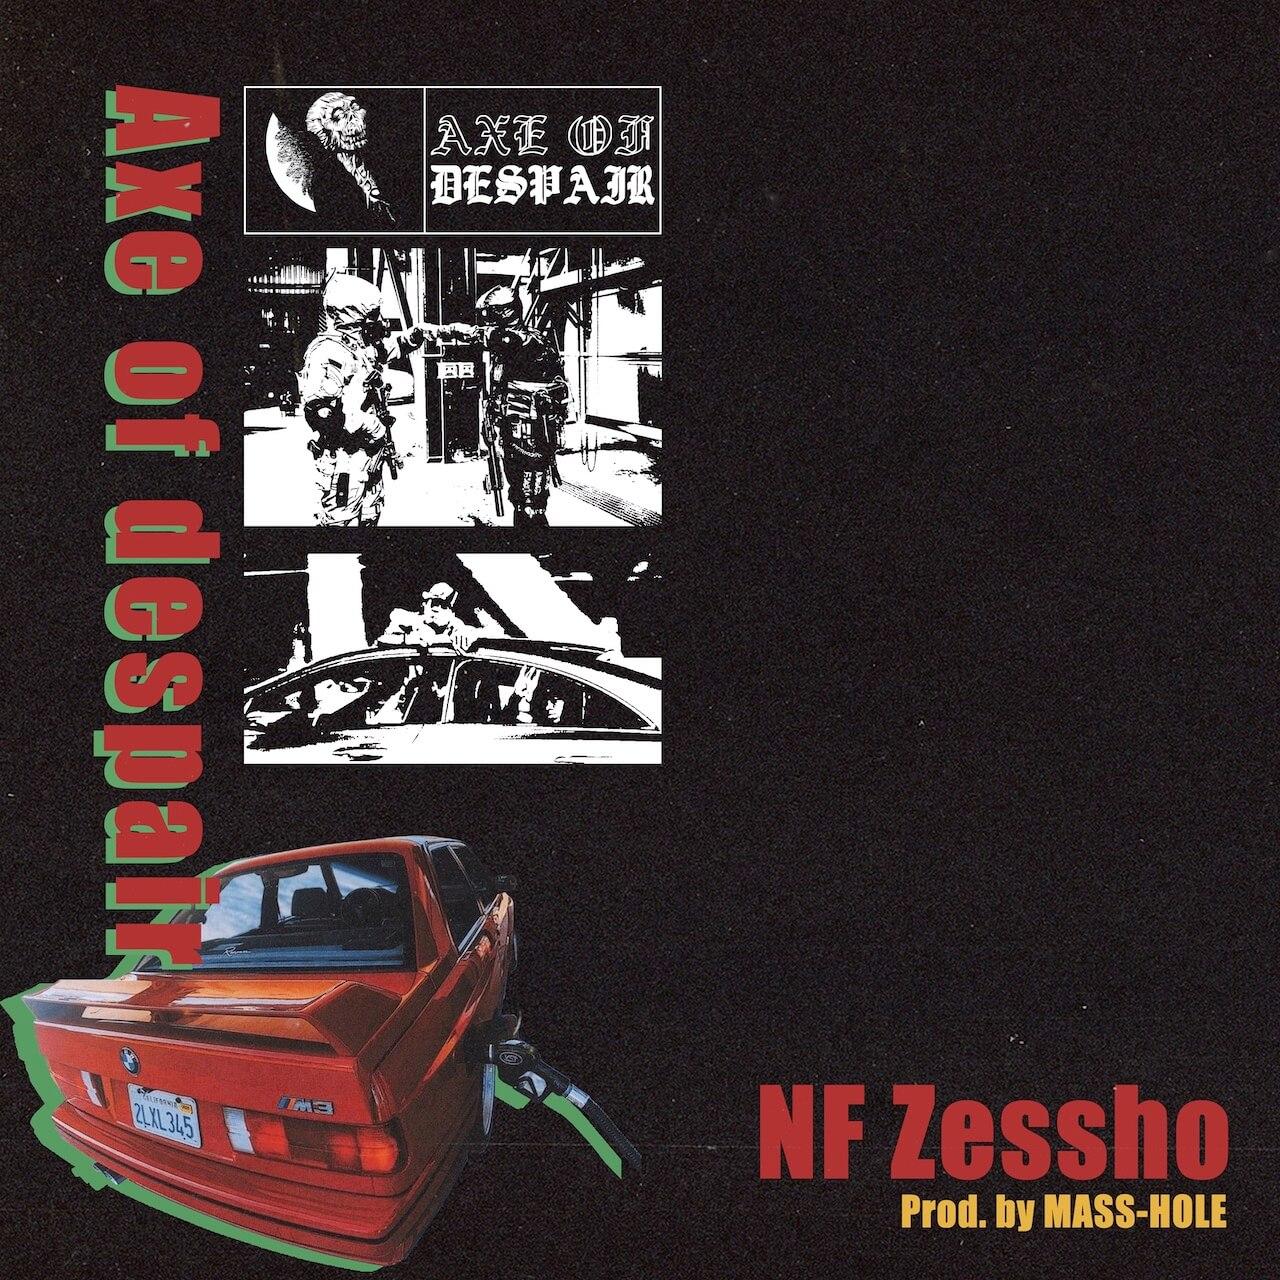 NF Zessho、MASS-HOLEをプロデューサーに迎えた新曲「Axe of despair」を発表|マスタリングはAru-2 music210611-nfzessho-masshole